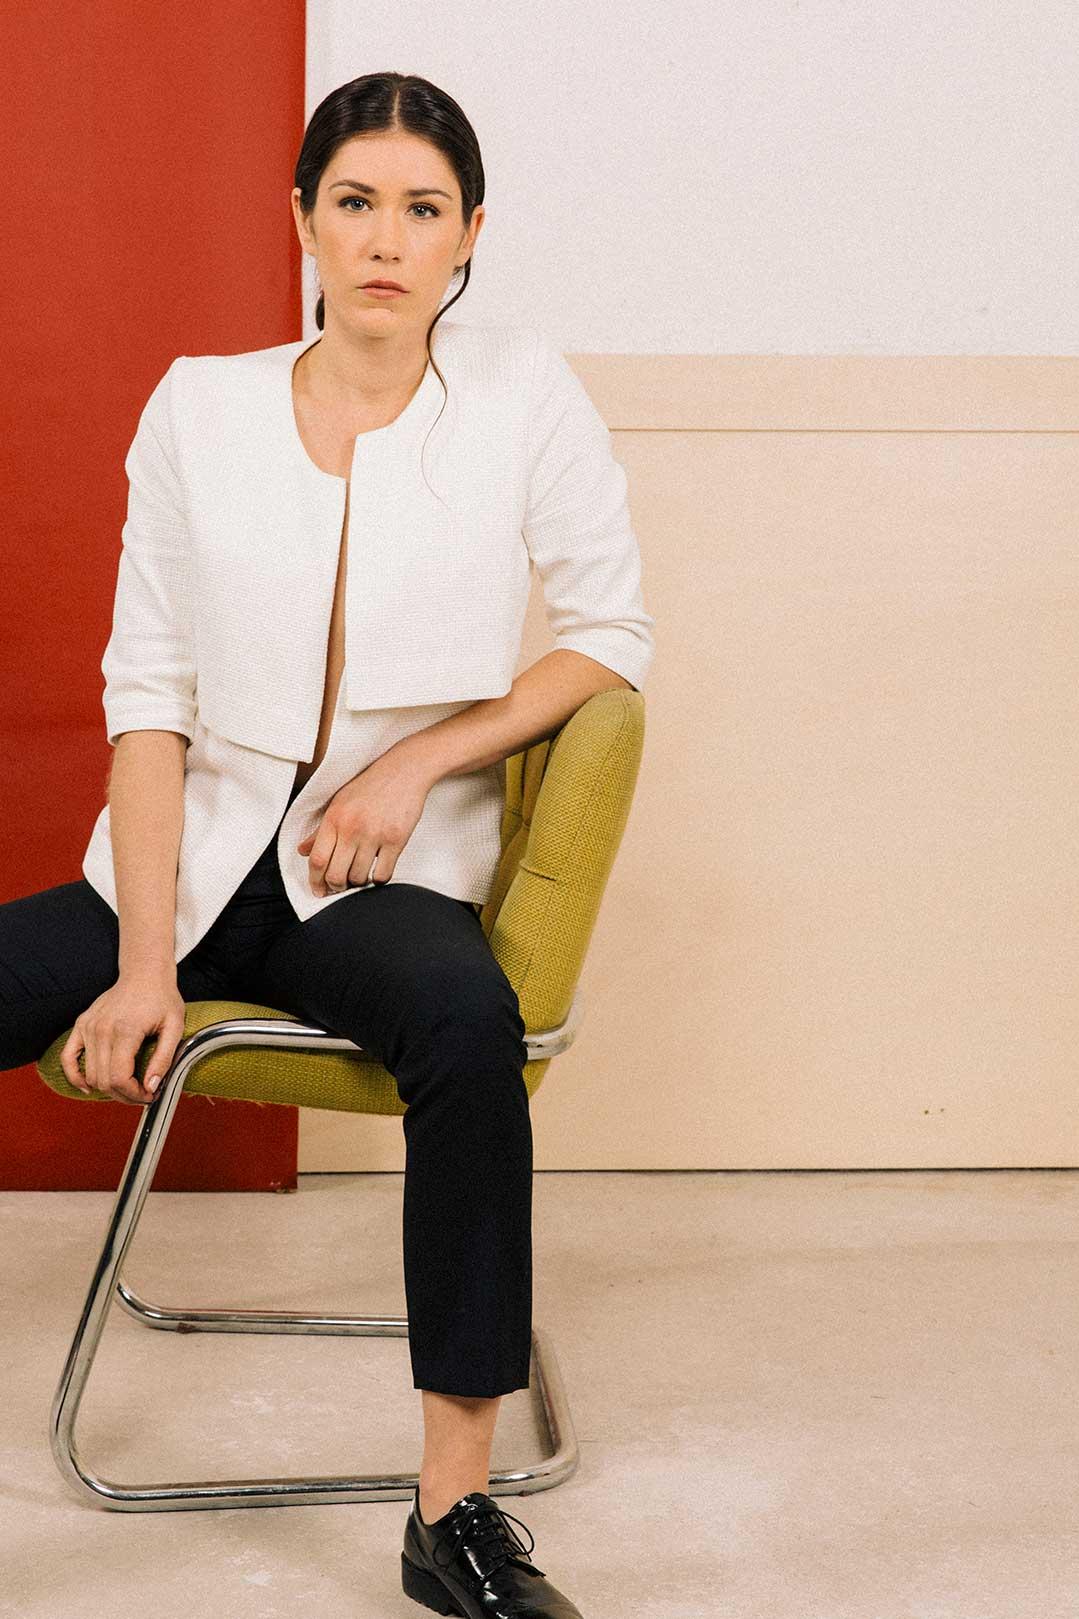 veste faustinebl atode atode vetement femme chic classe et co responsable made in france. Black Bedroom Furniture Sets. Home Design Ideas